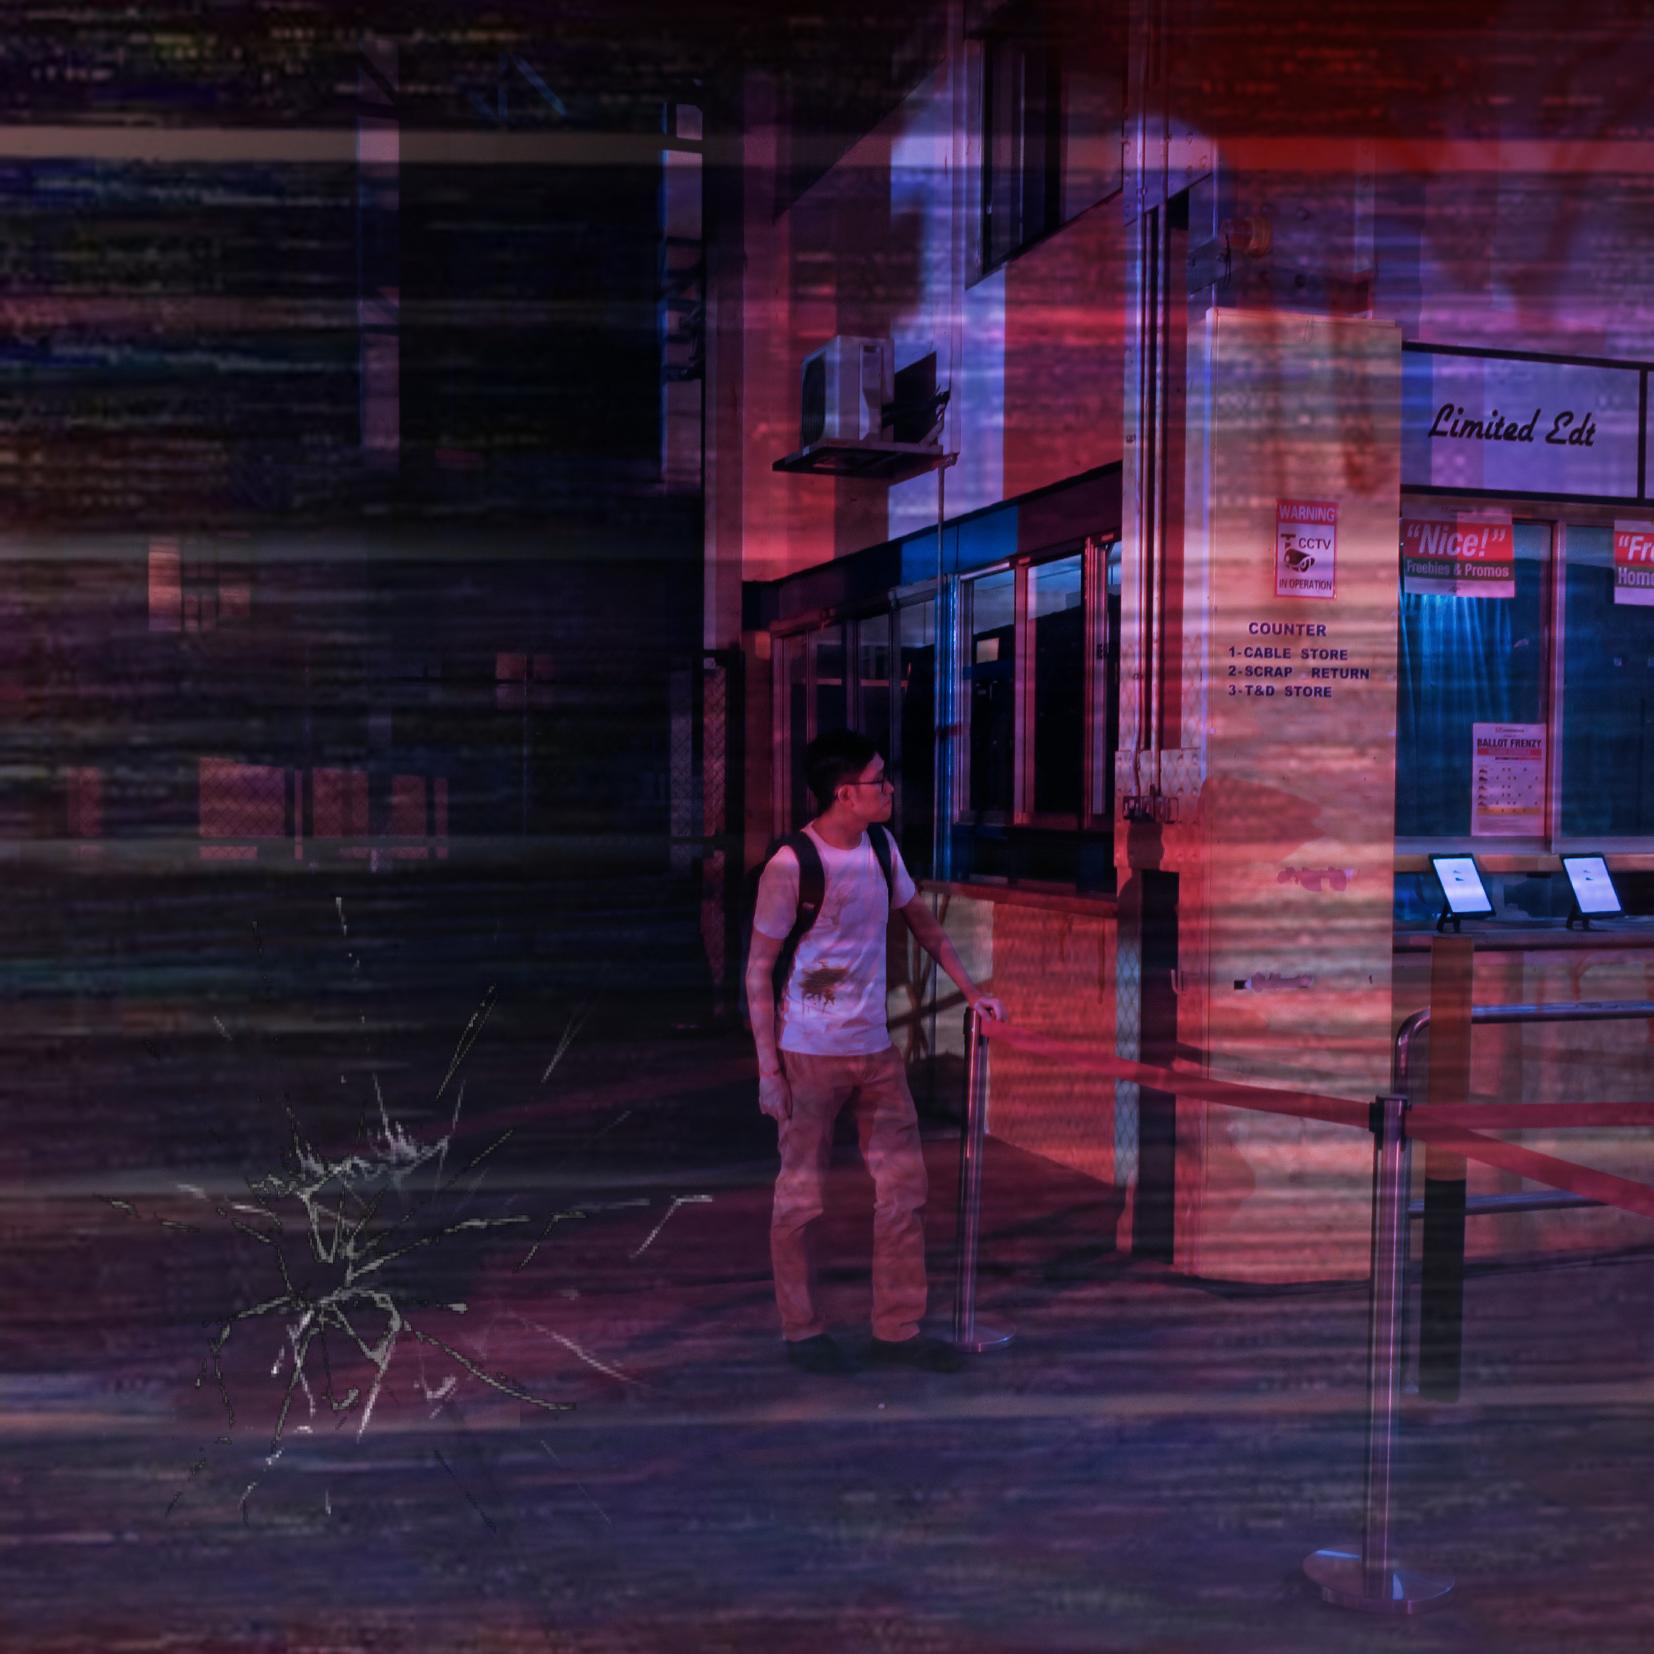 Distortion Digital Art by Alvin Sim